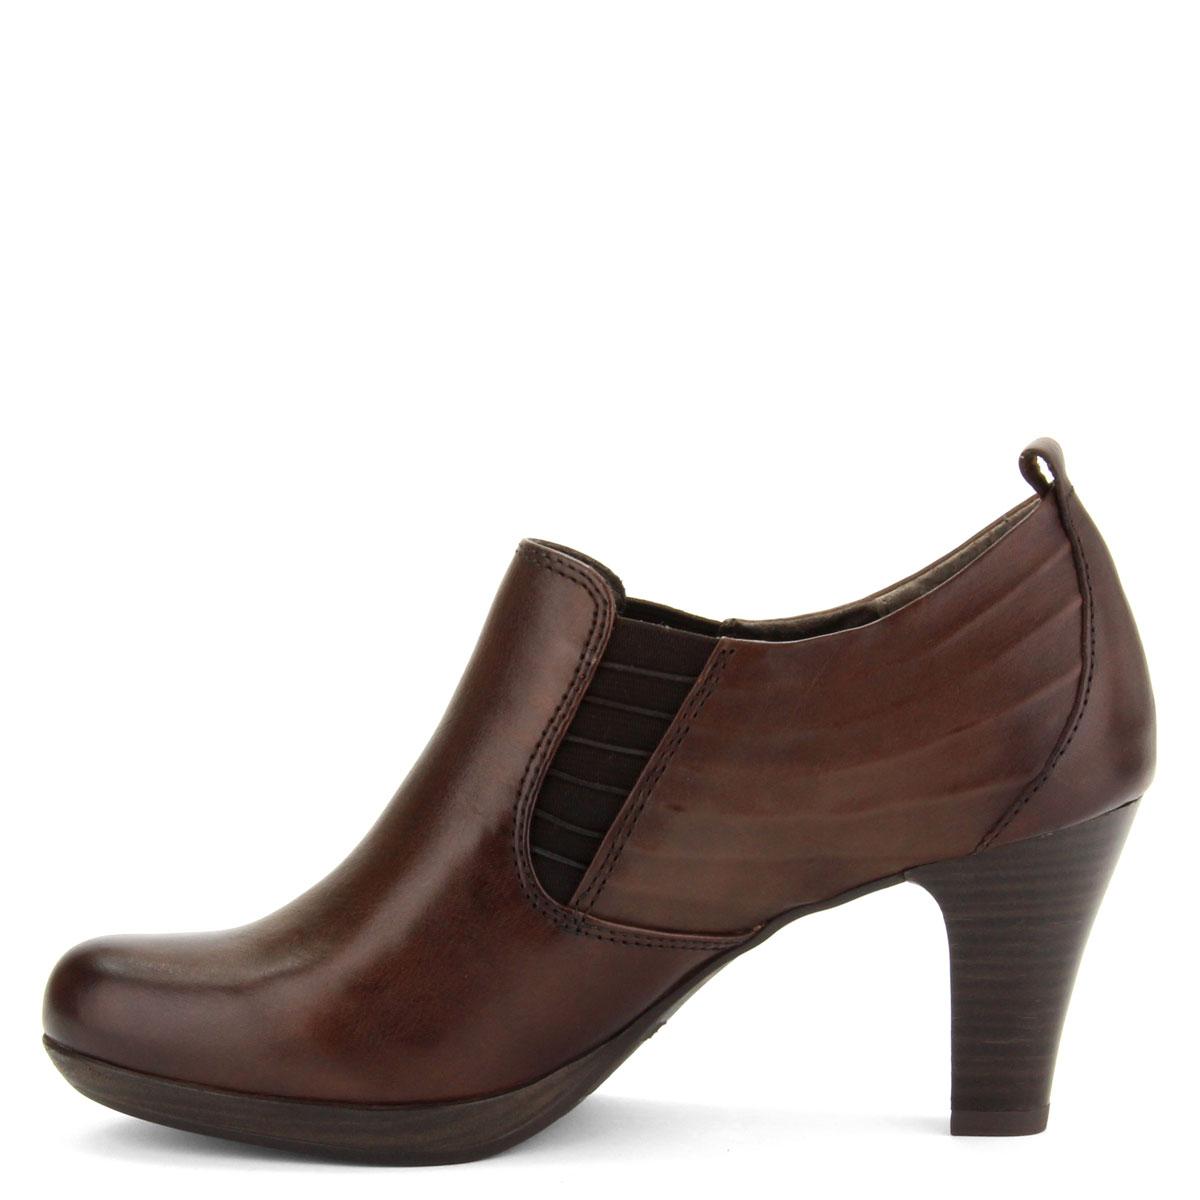 ... Platformos Tamaris női cipő barna színben. Sarka 7 cm magas c7de303438